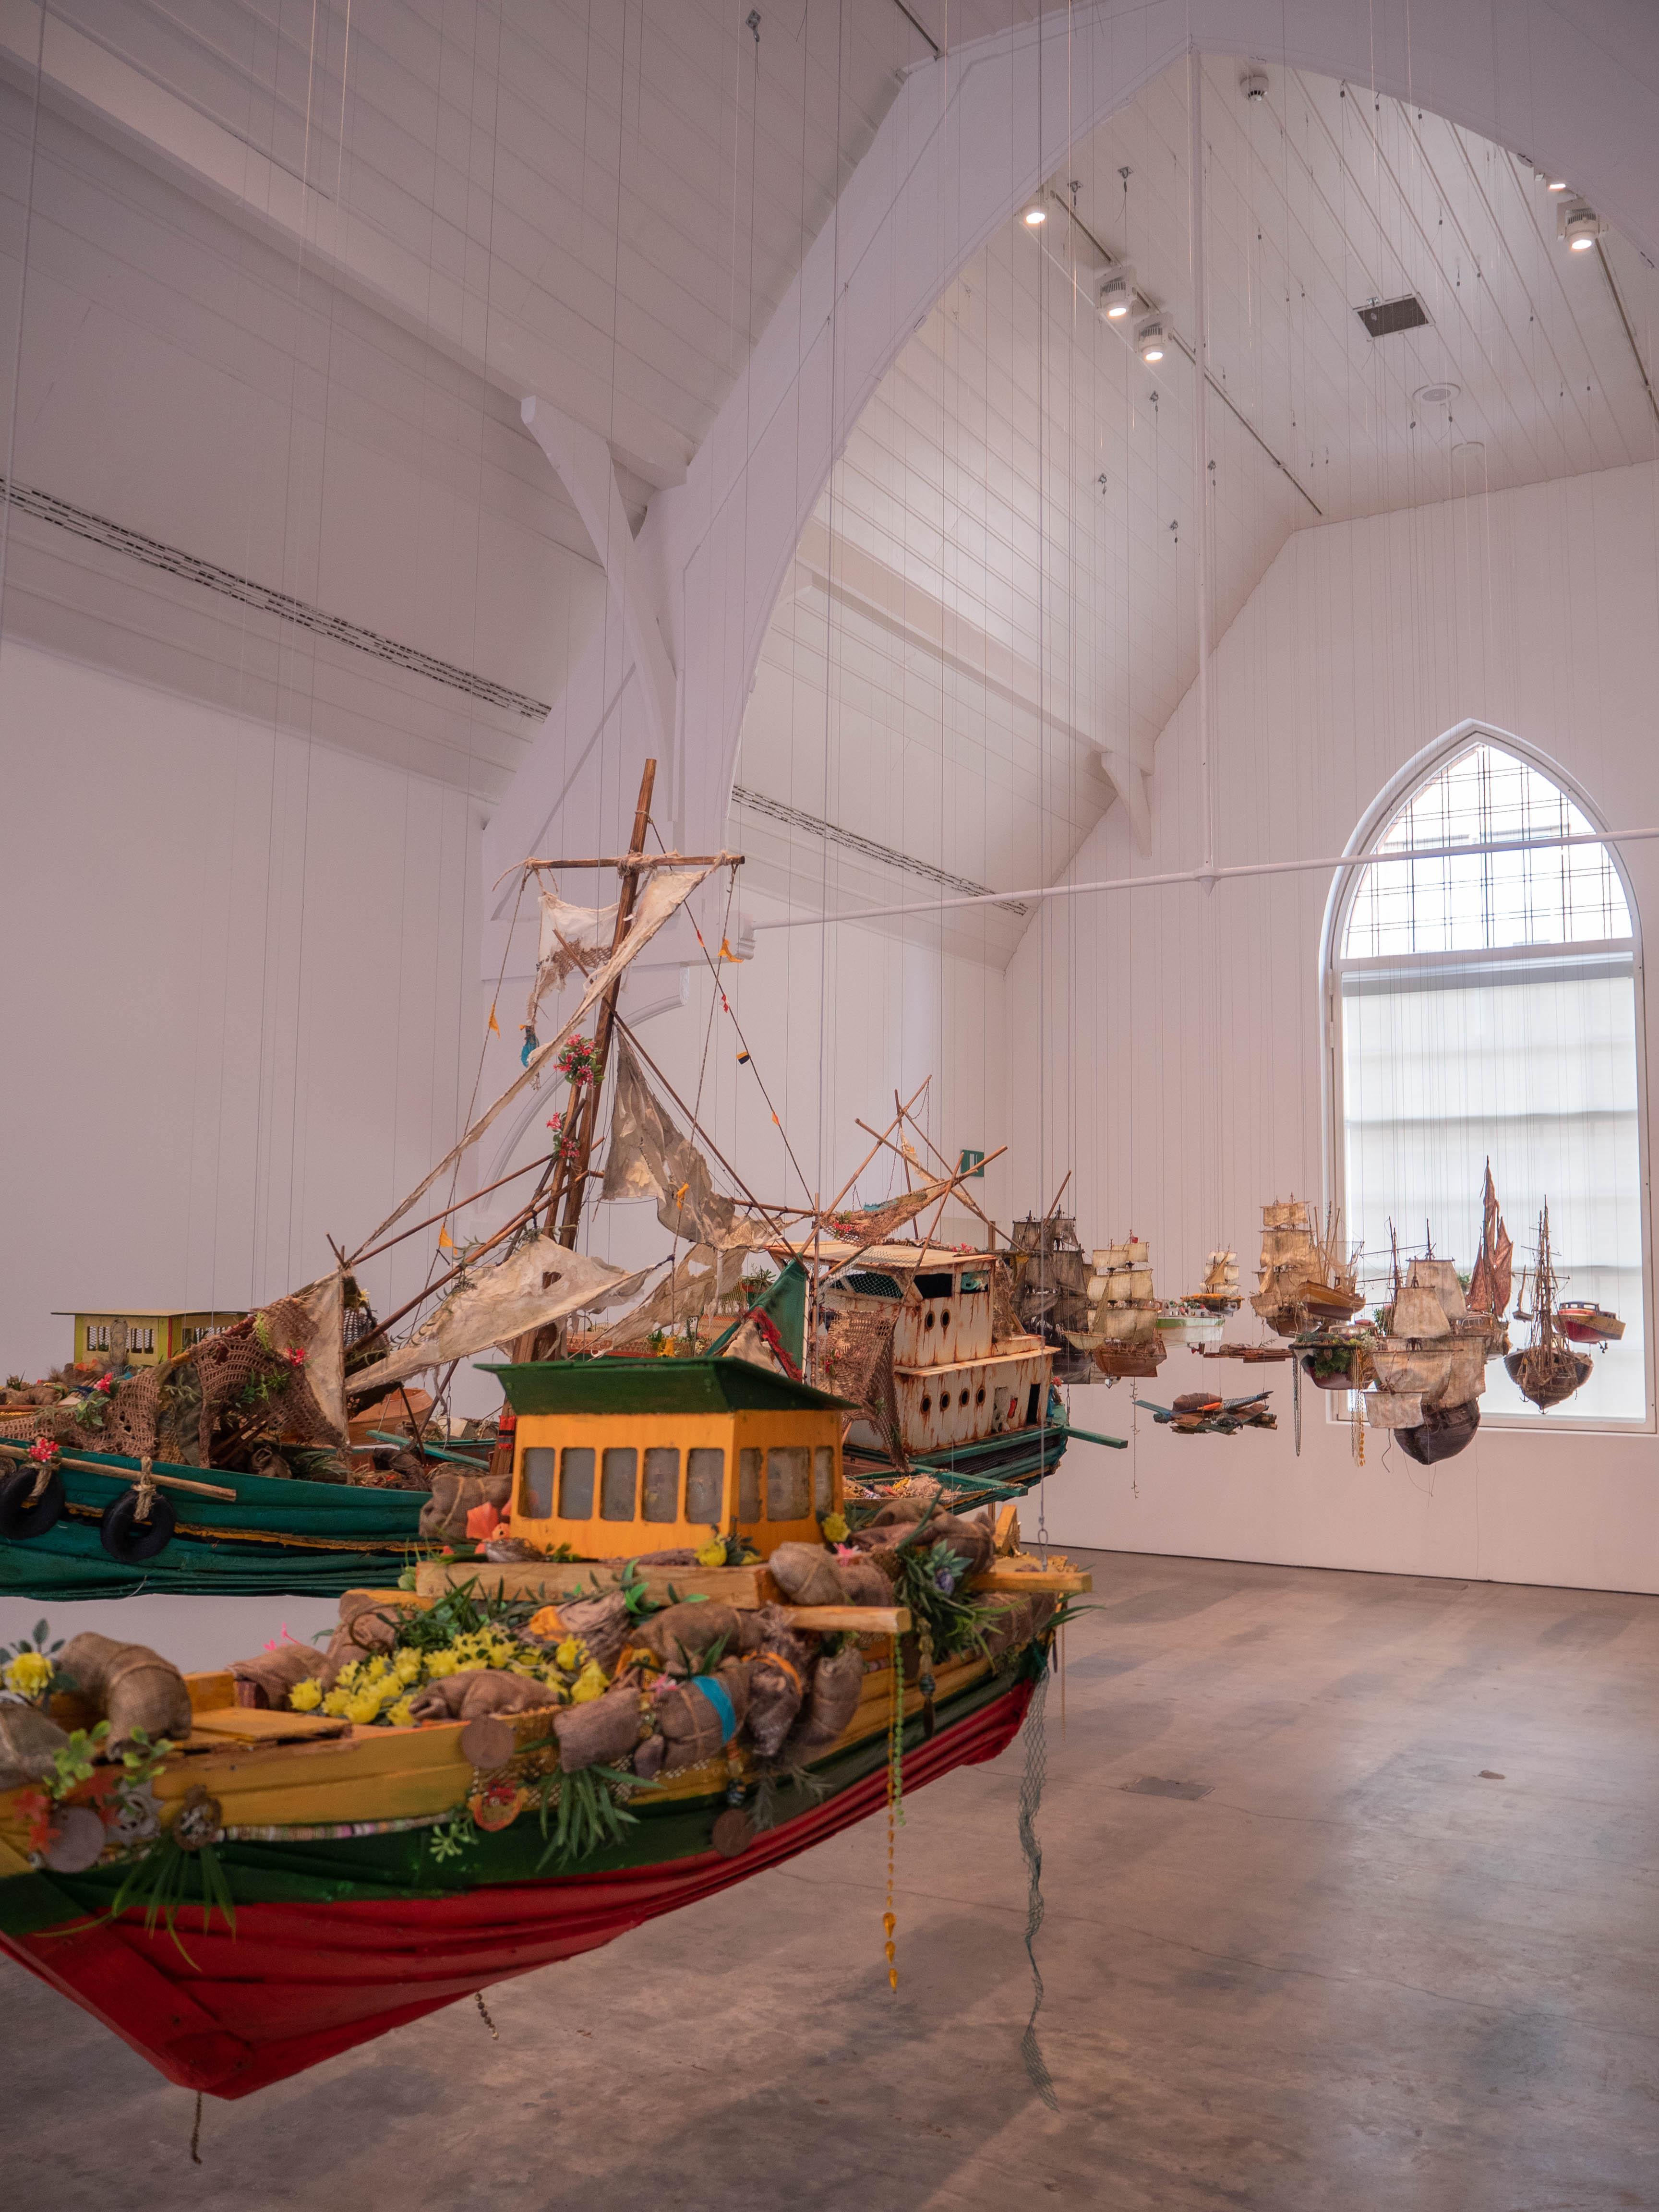 An art exhibit at Ikon Gallery in Birmingham